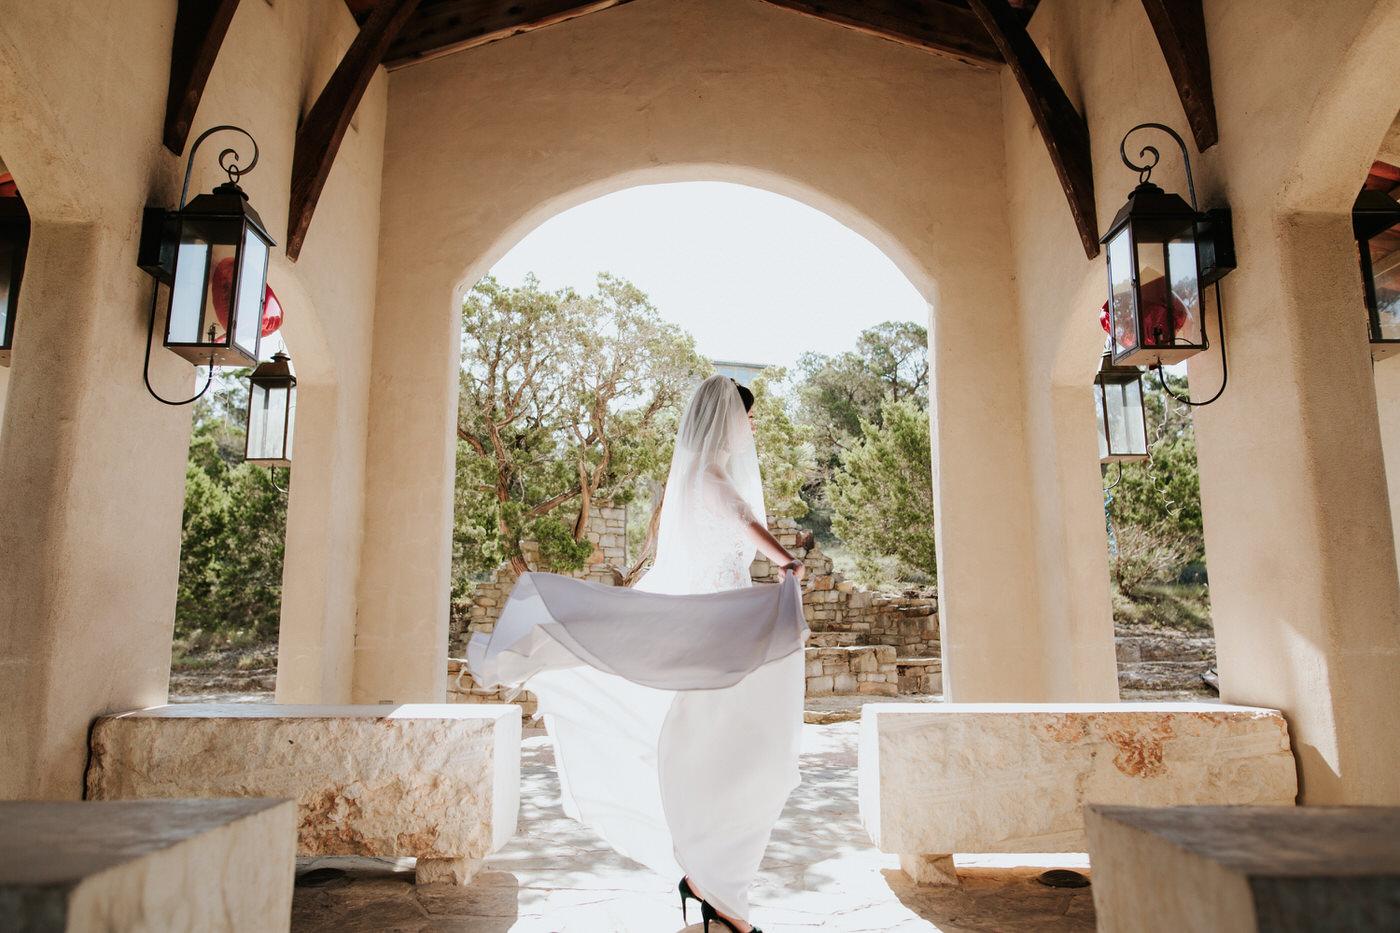 Chapel Dulcinea Wedding - Diana Ascarrrunz Photography -188.jpg